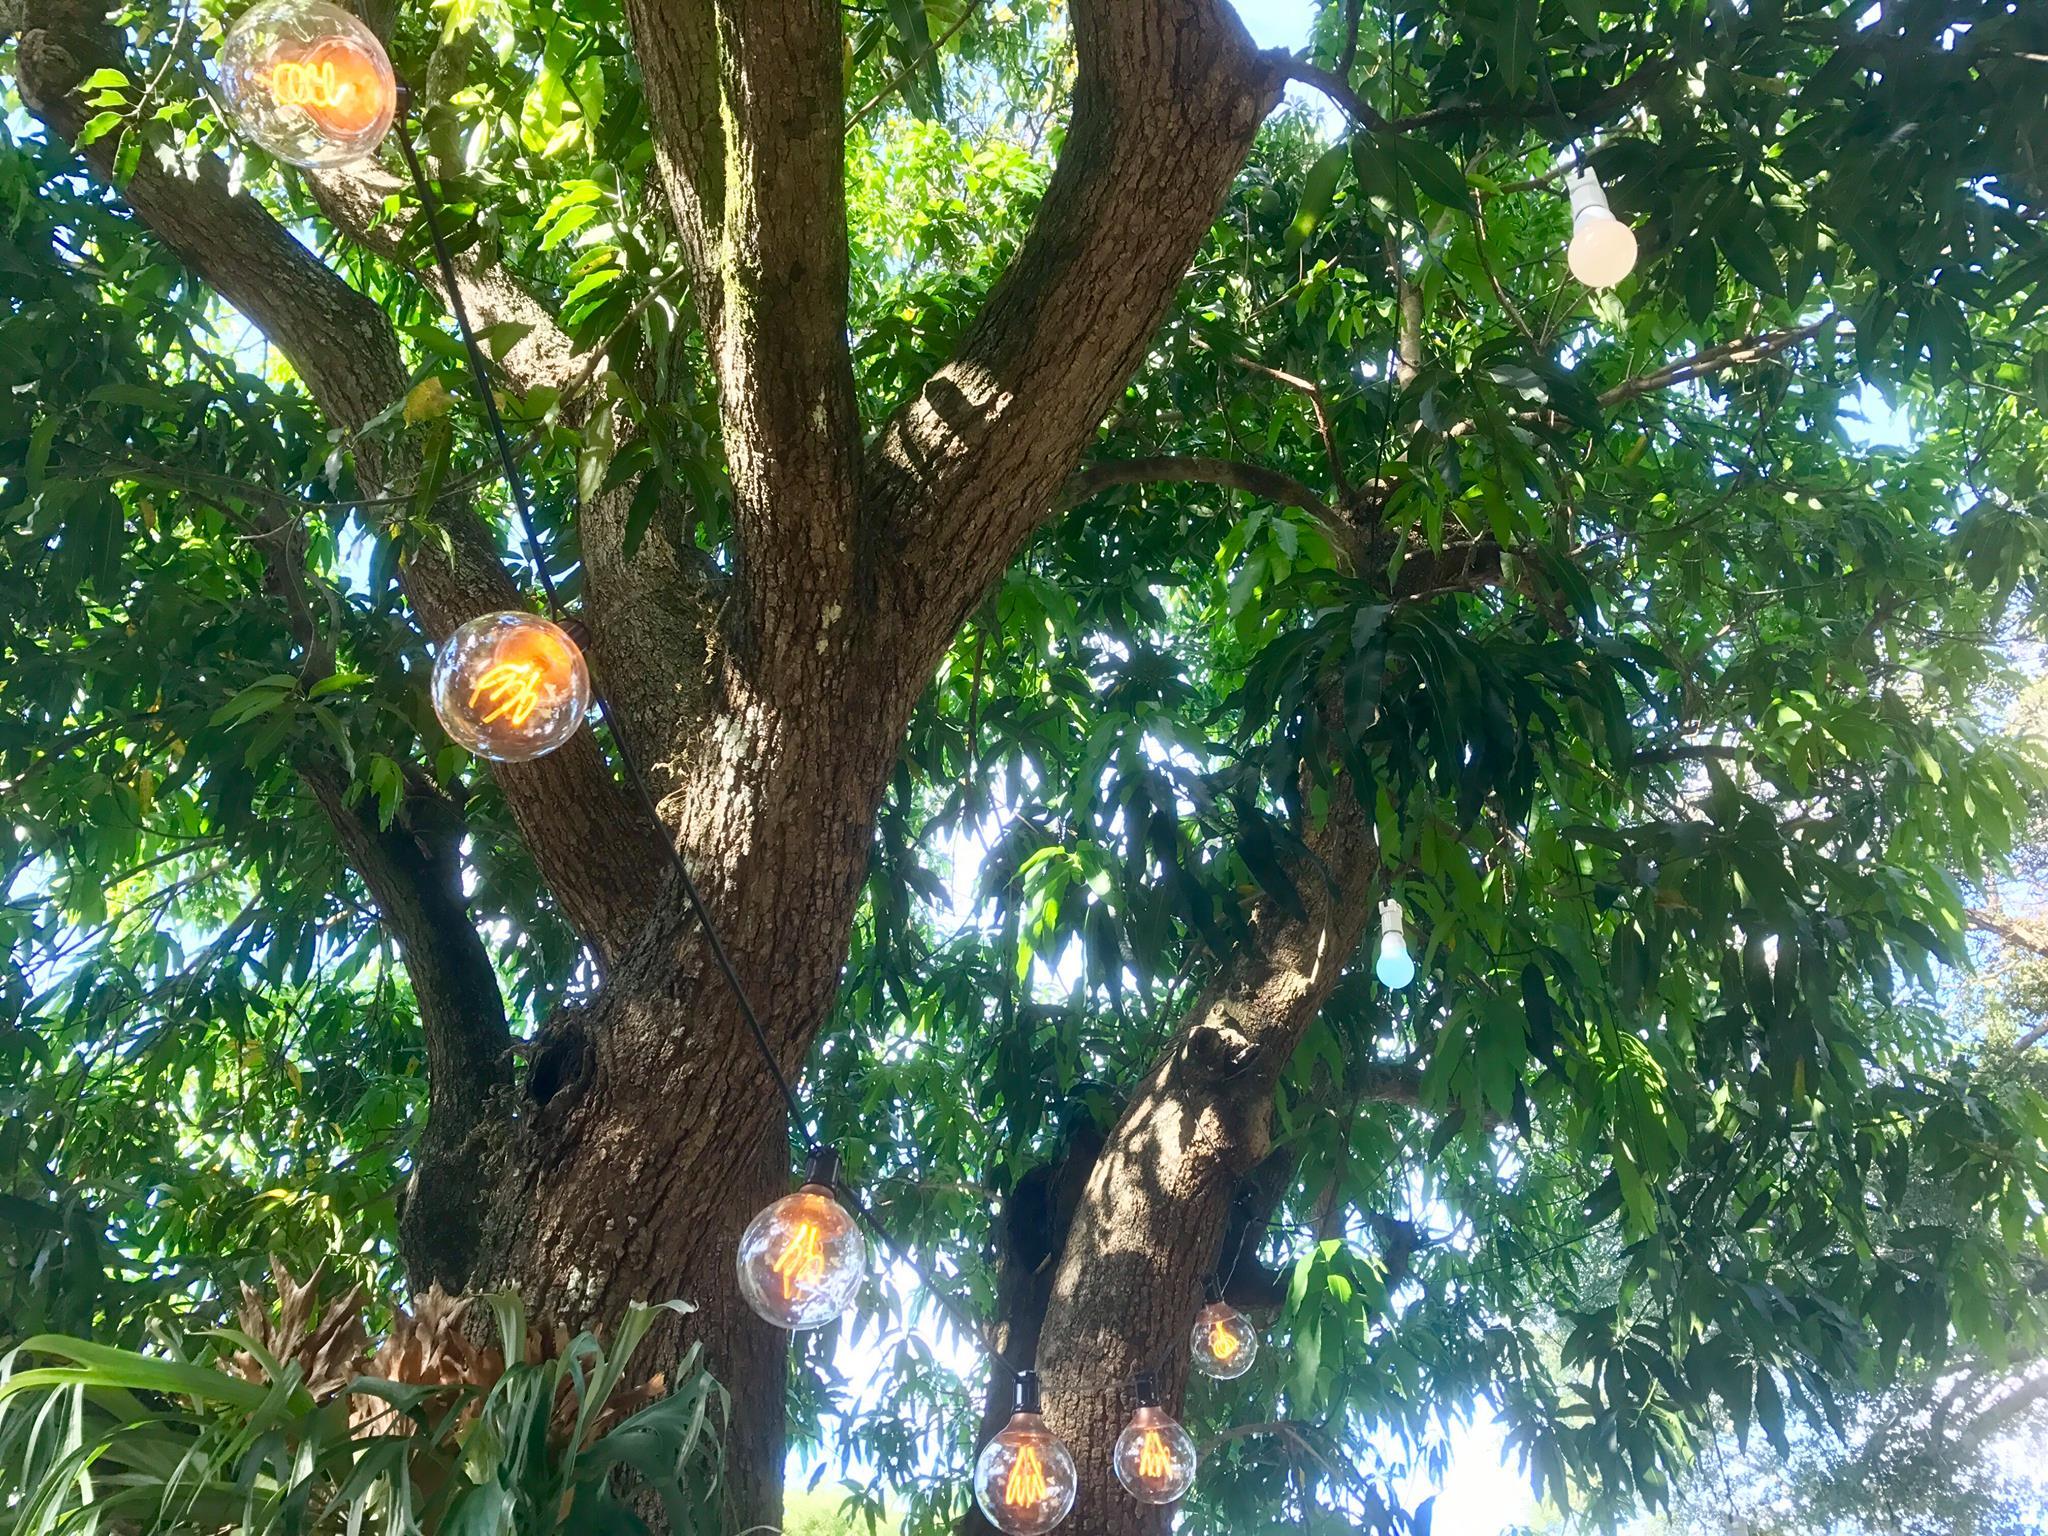 Lighting, string lights, backyard bash, near Miami Shores, FL